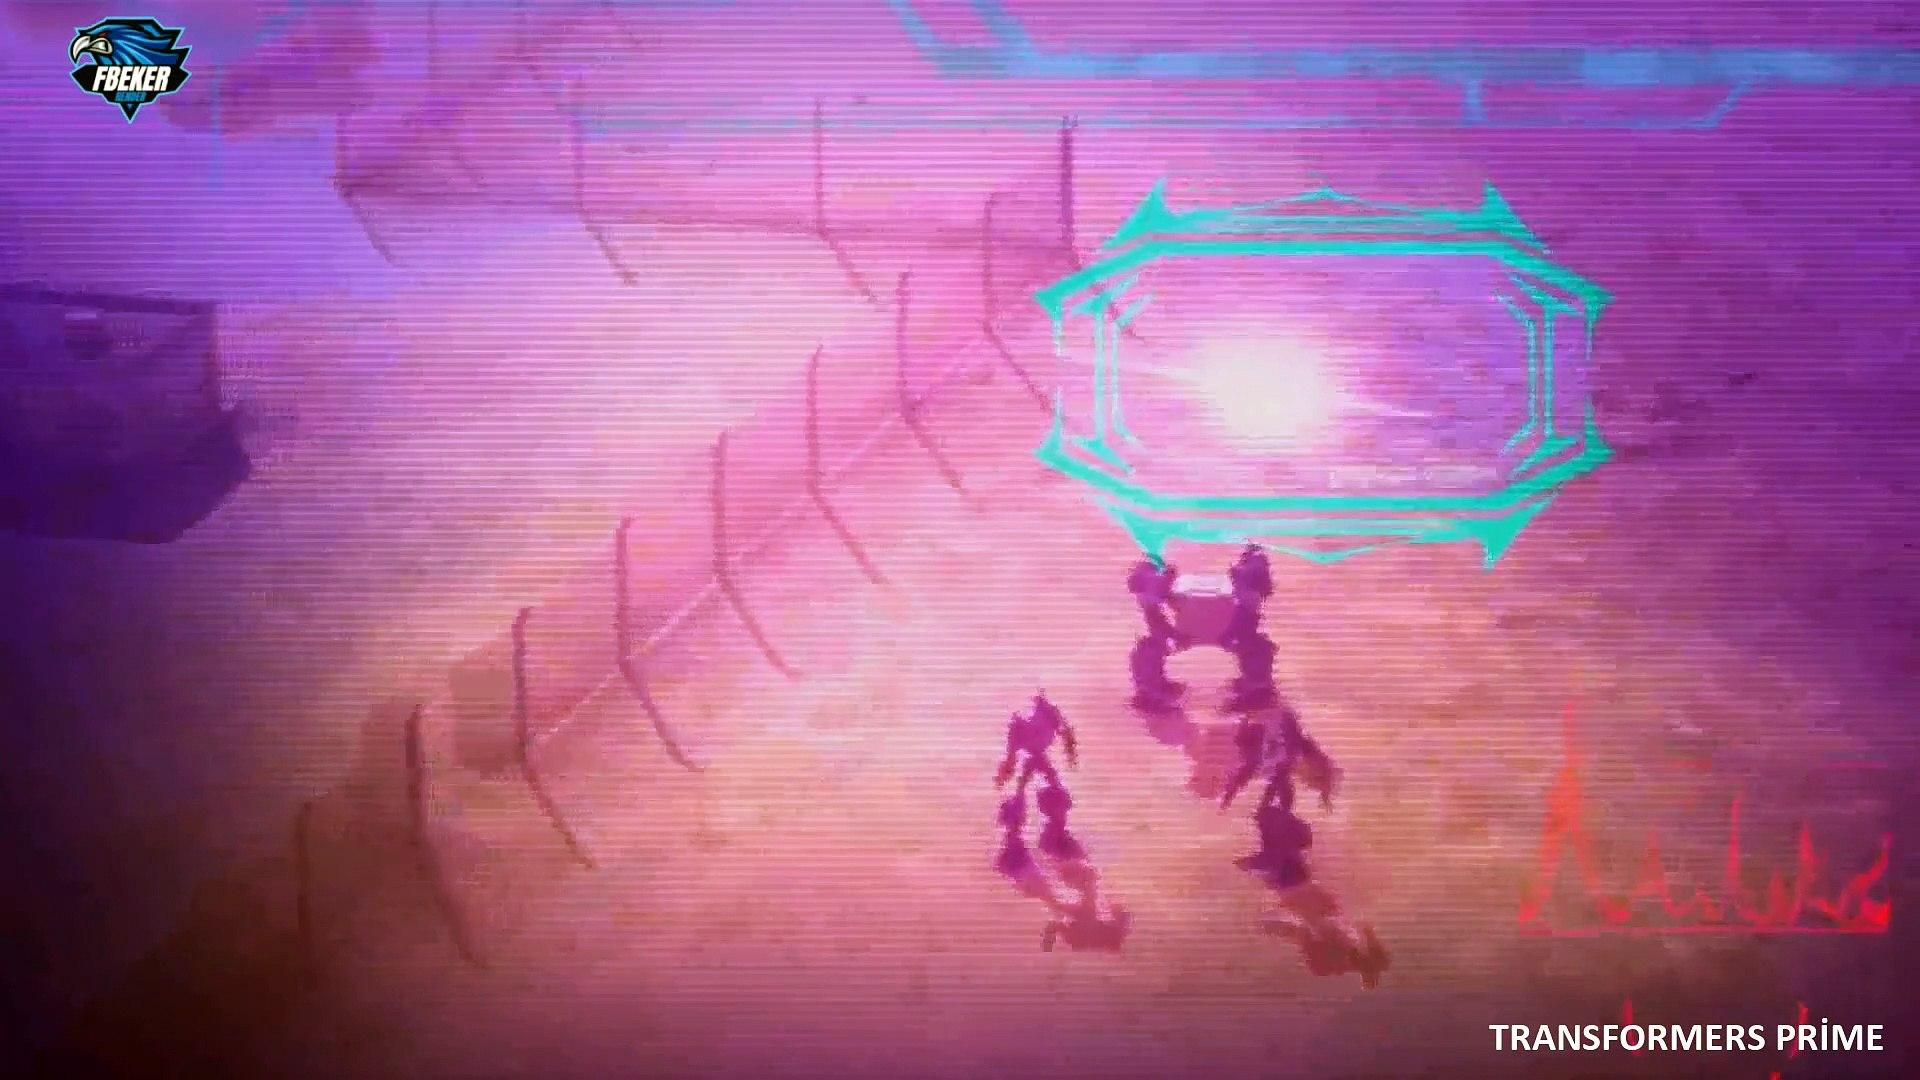 Transformers Prime 62.Bölüm Eski Bir Full Hd